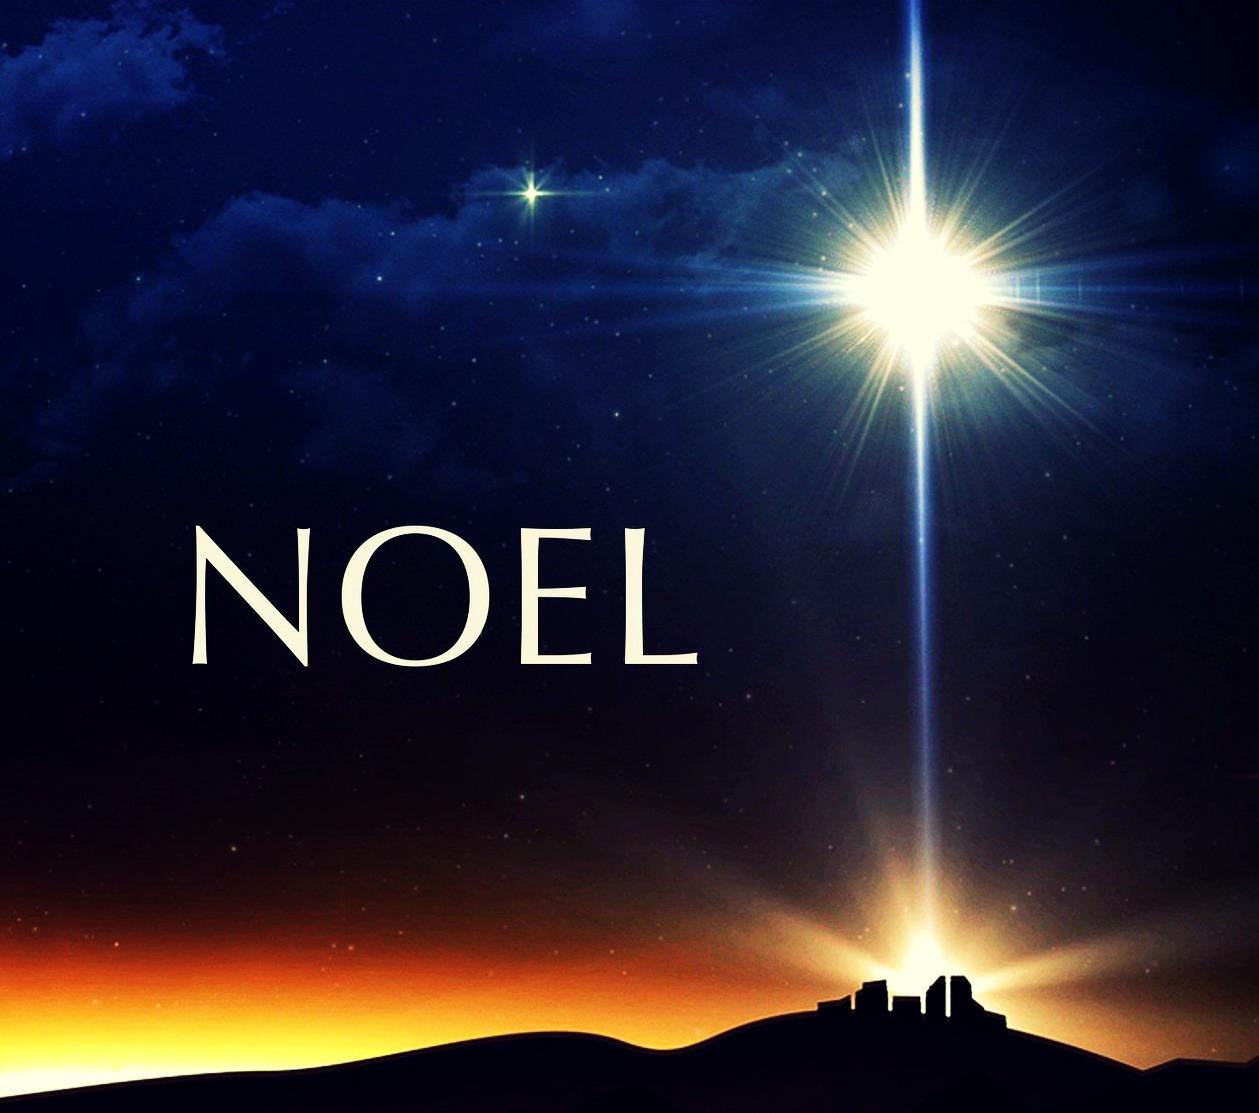 Image De Noel Jesus.Noel Pm Antioch Baptist Church